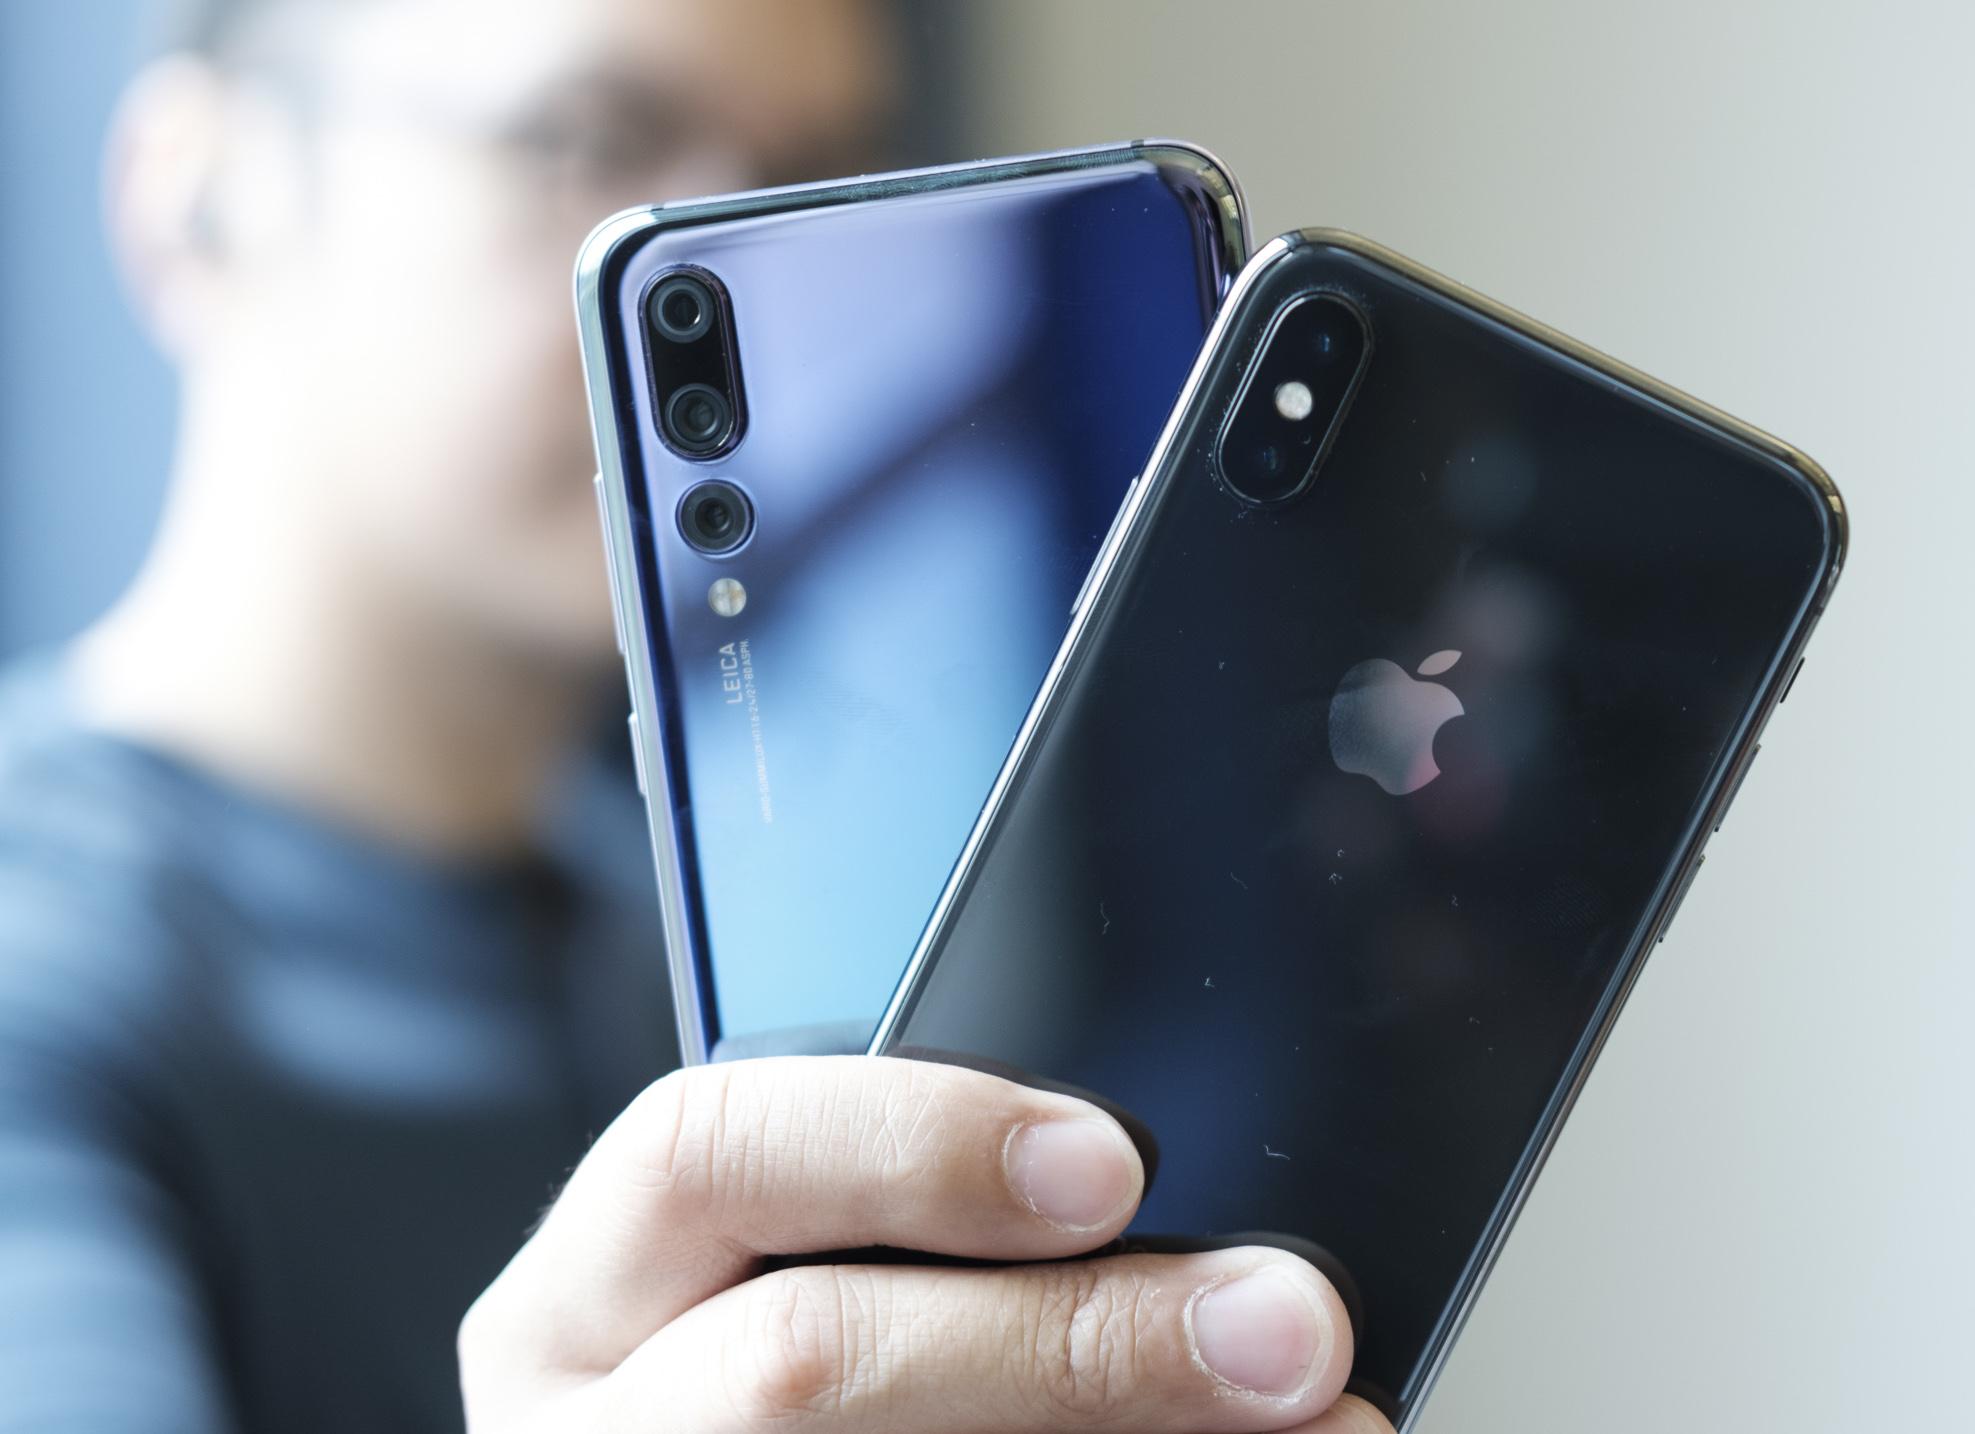 iPhone-X-vs-Huawei-P20-7-of-12-1.jpg